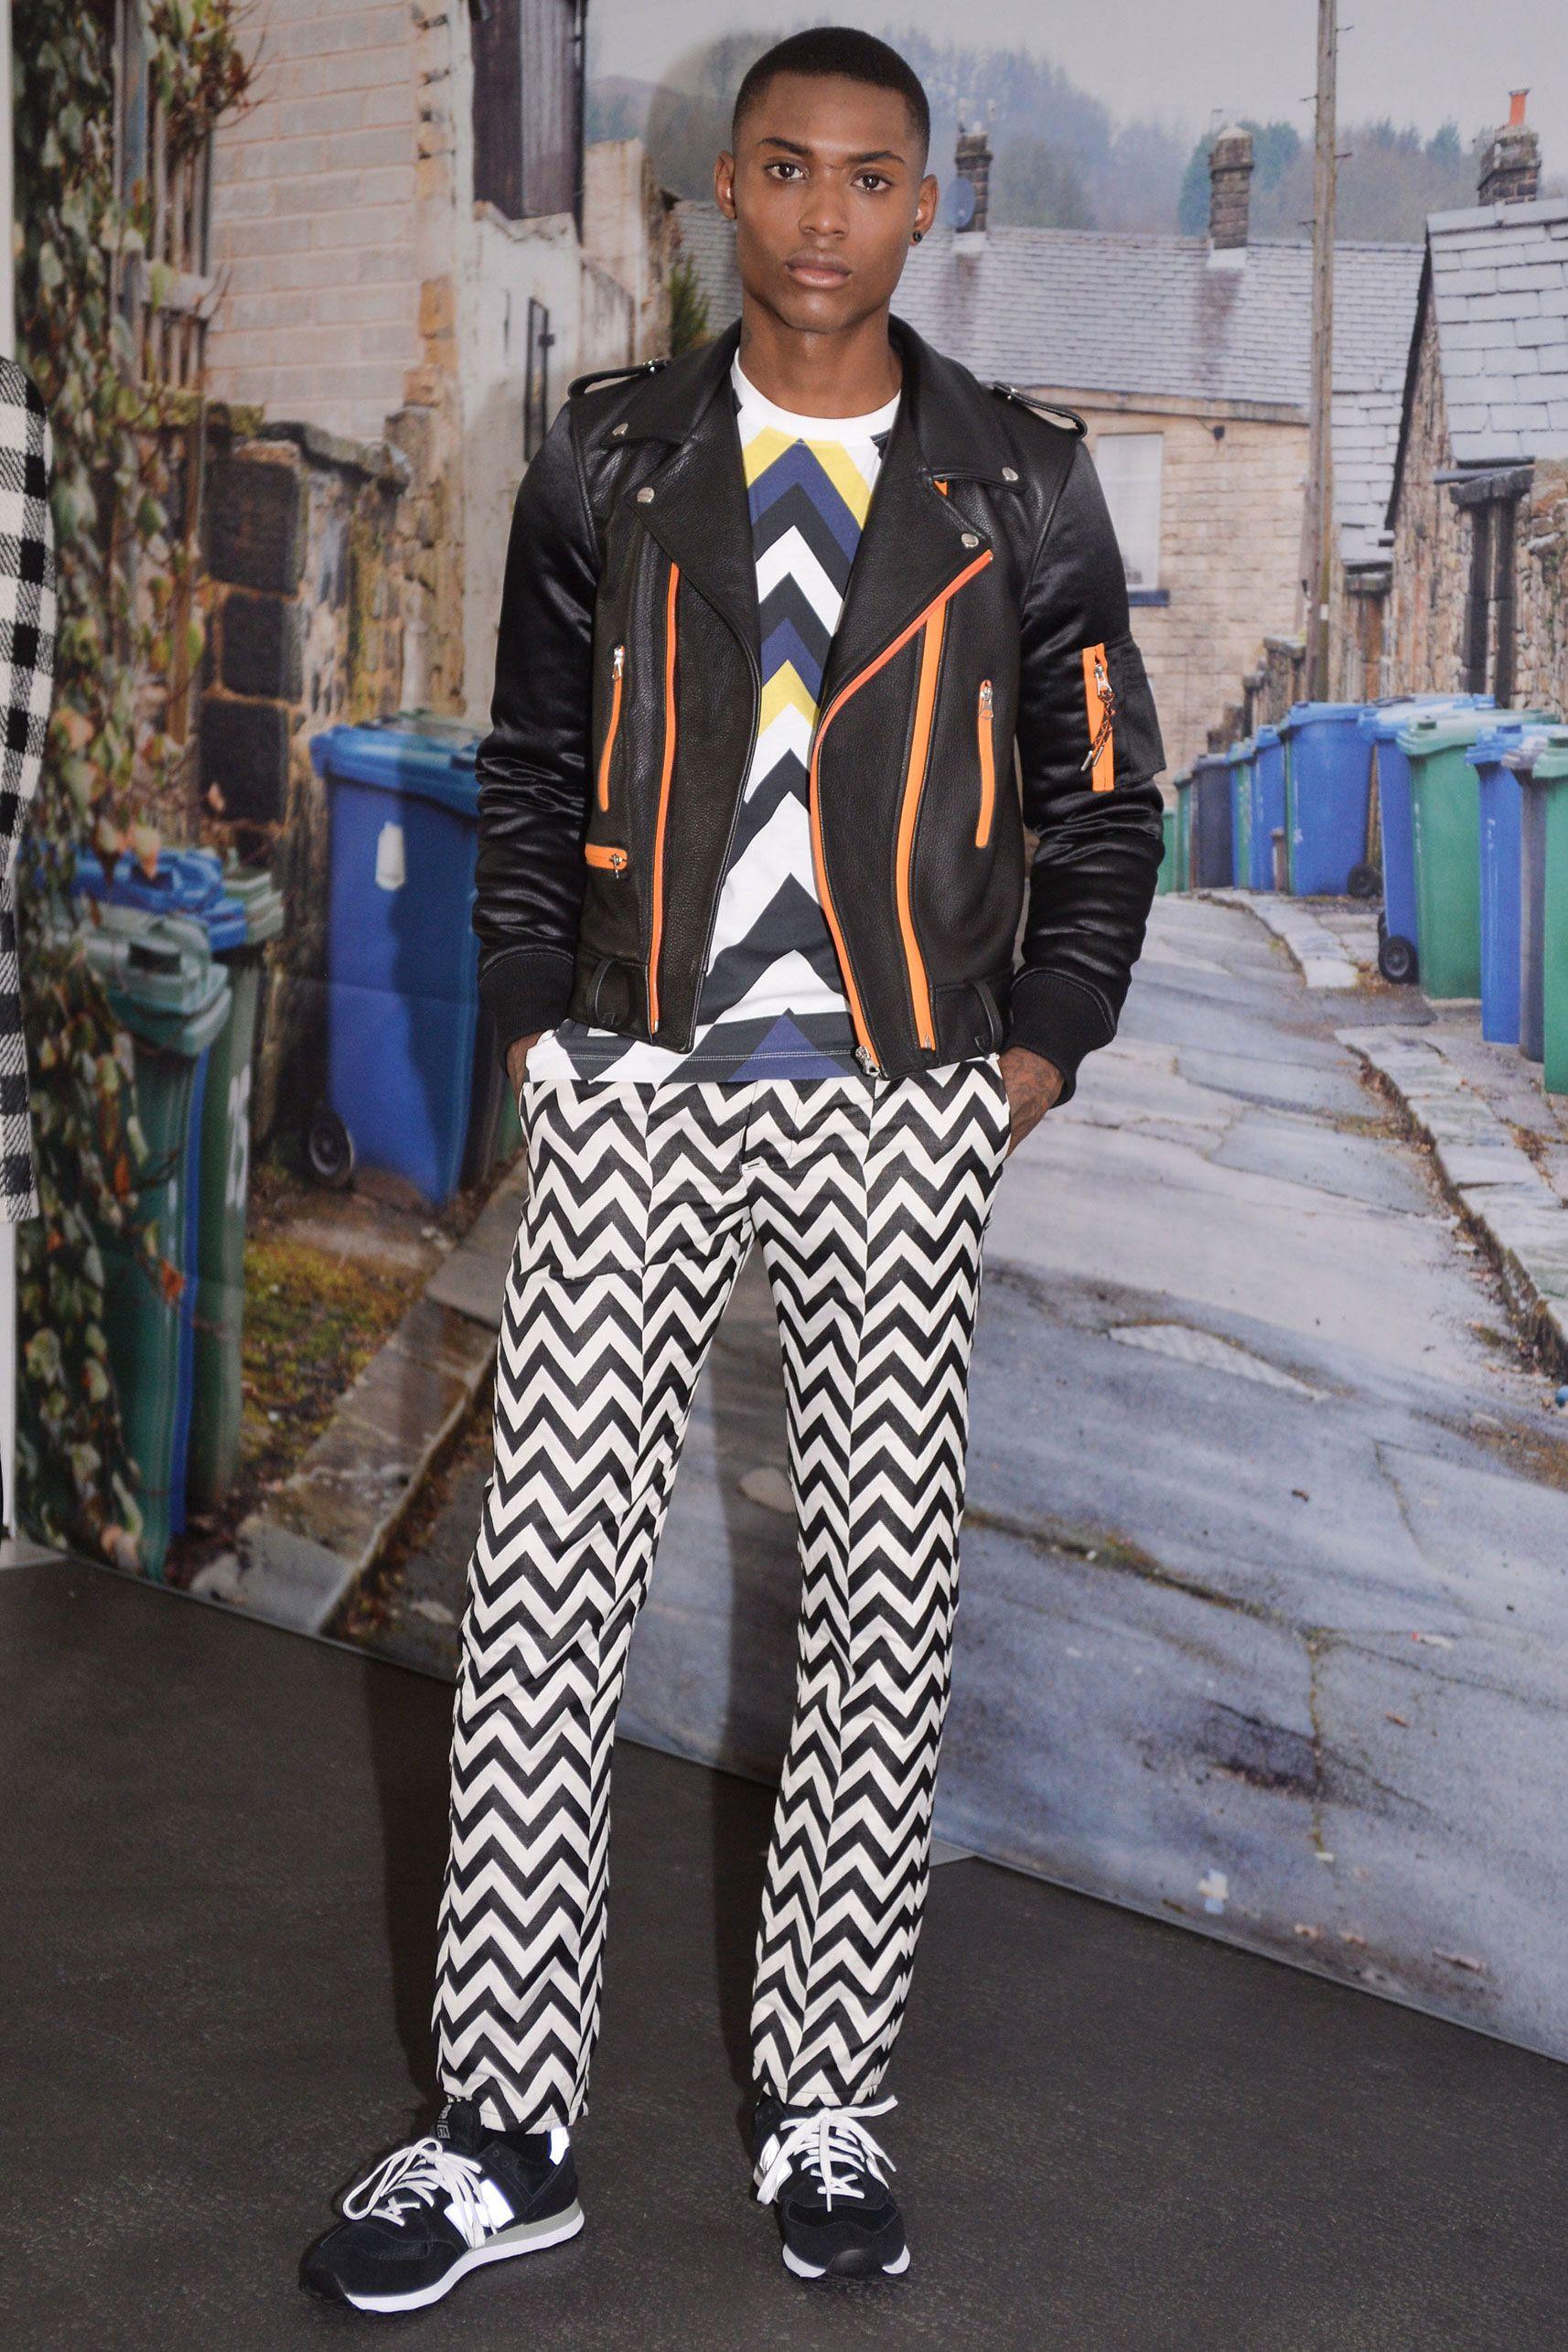 Diego fragoso page 11 the fashion spot - 3 Http Pixel Nymag Com Imgs Fashion 0 H1330 2x Jpg